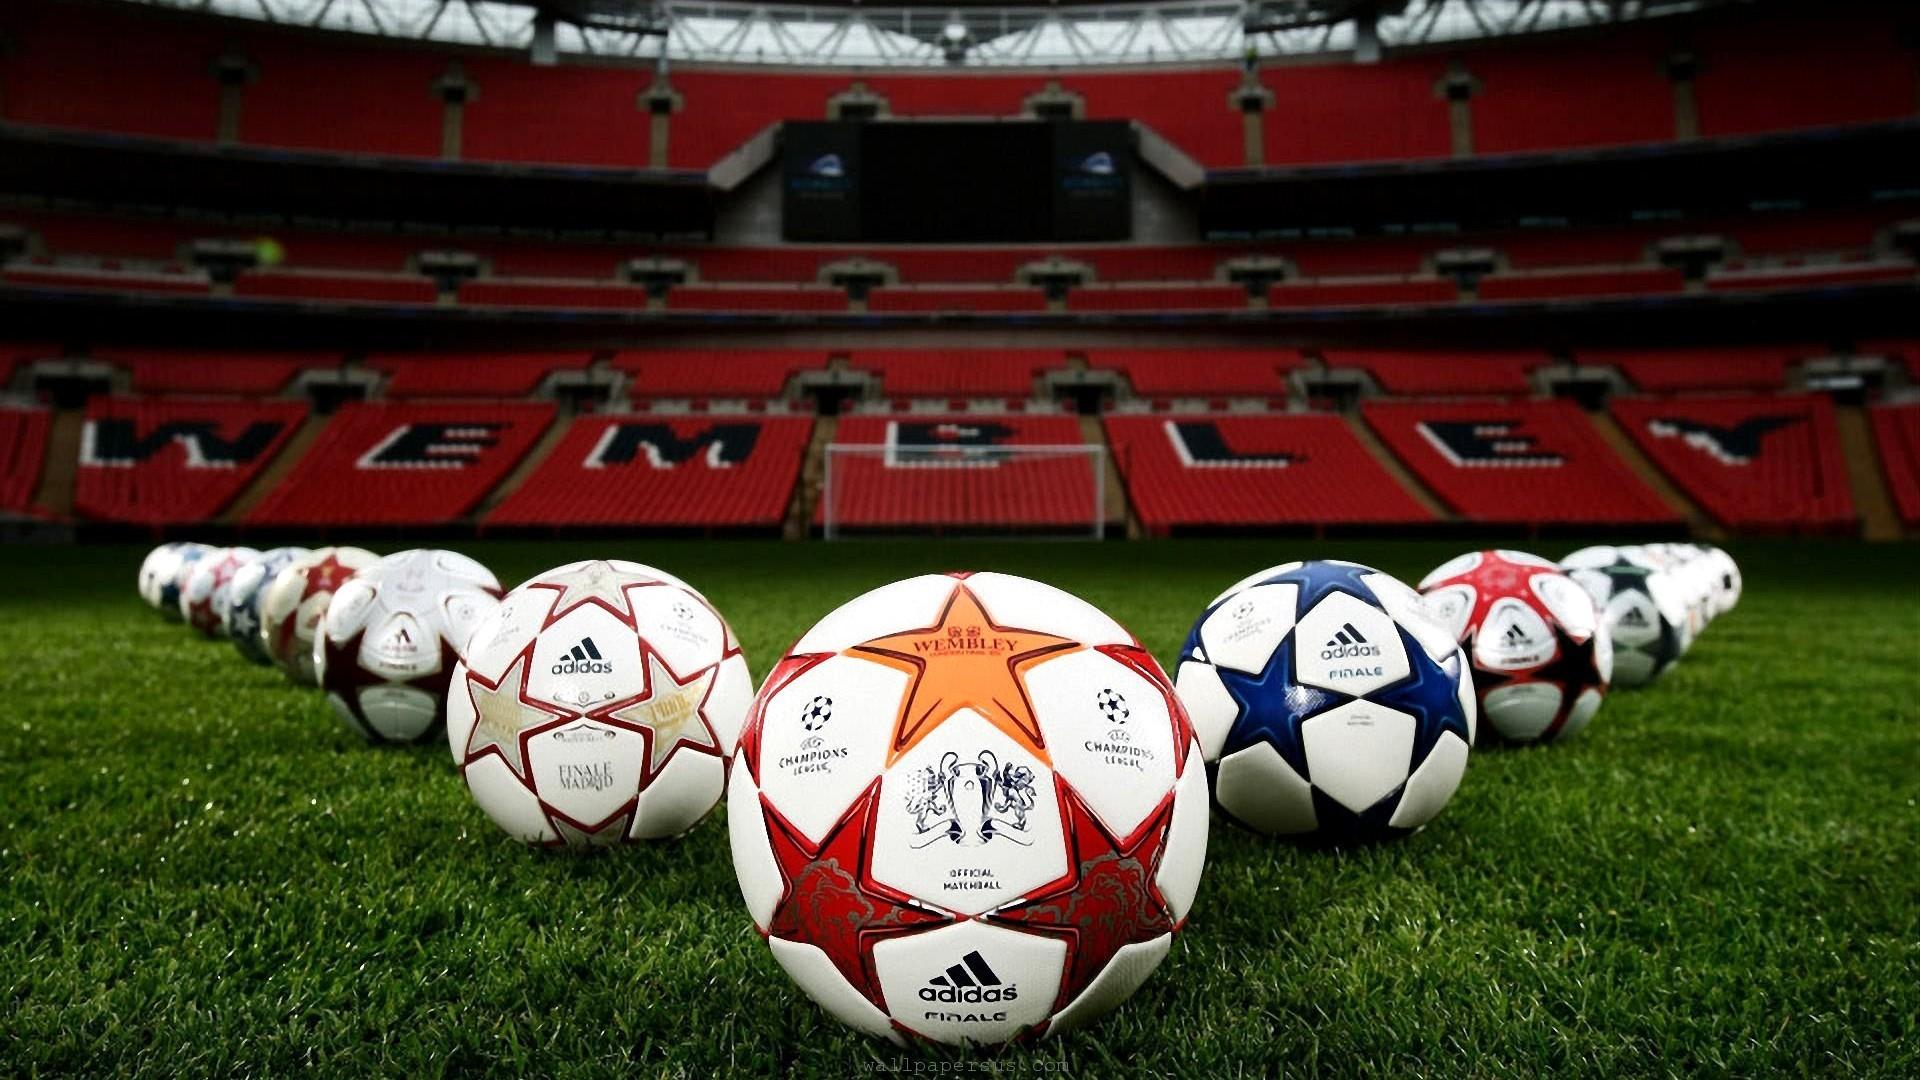 UEFA Champions League Ball Wembley Final 2013 HD Wallpaper